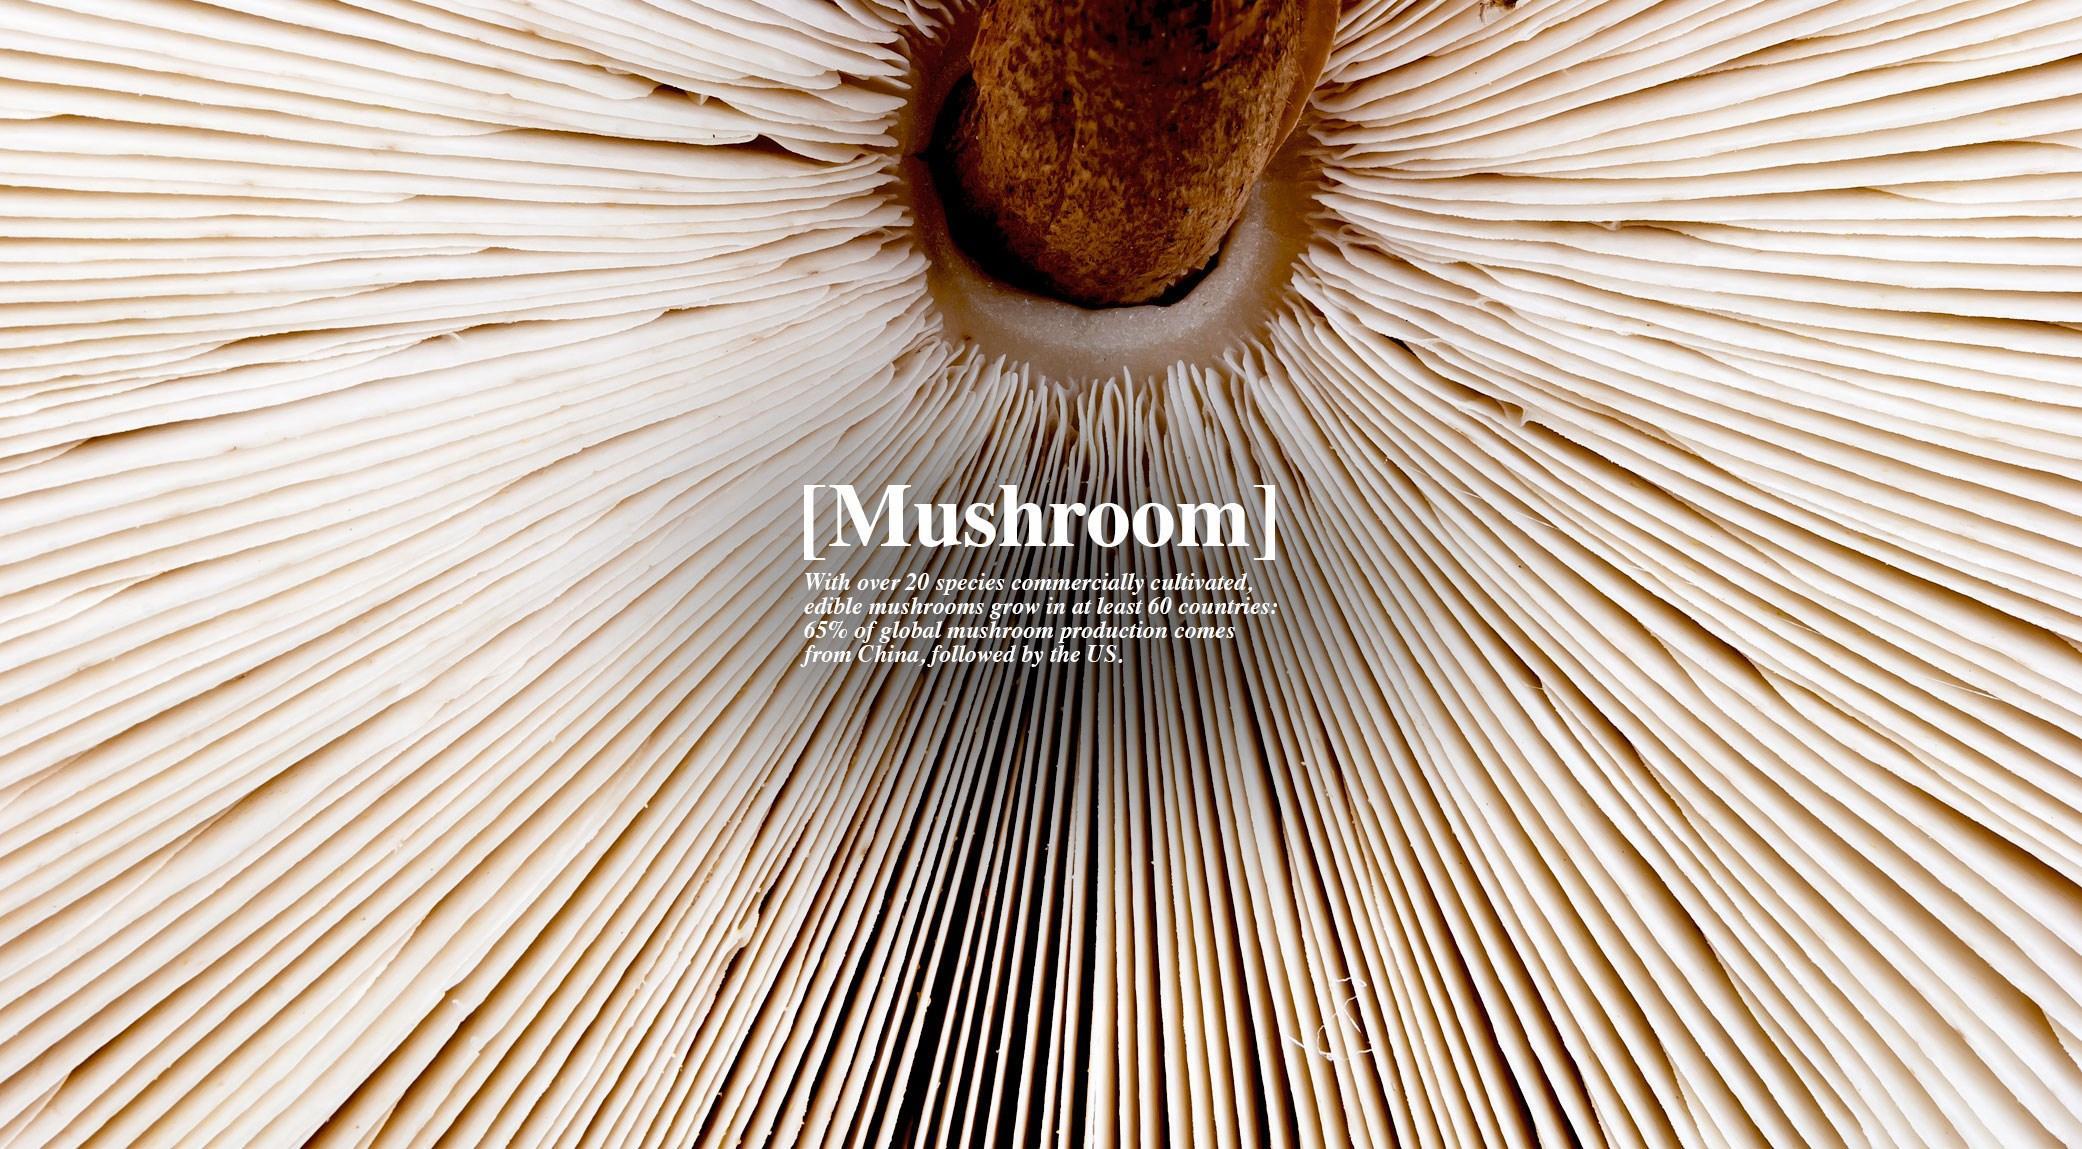 007-mushroom-finedininglovers